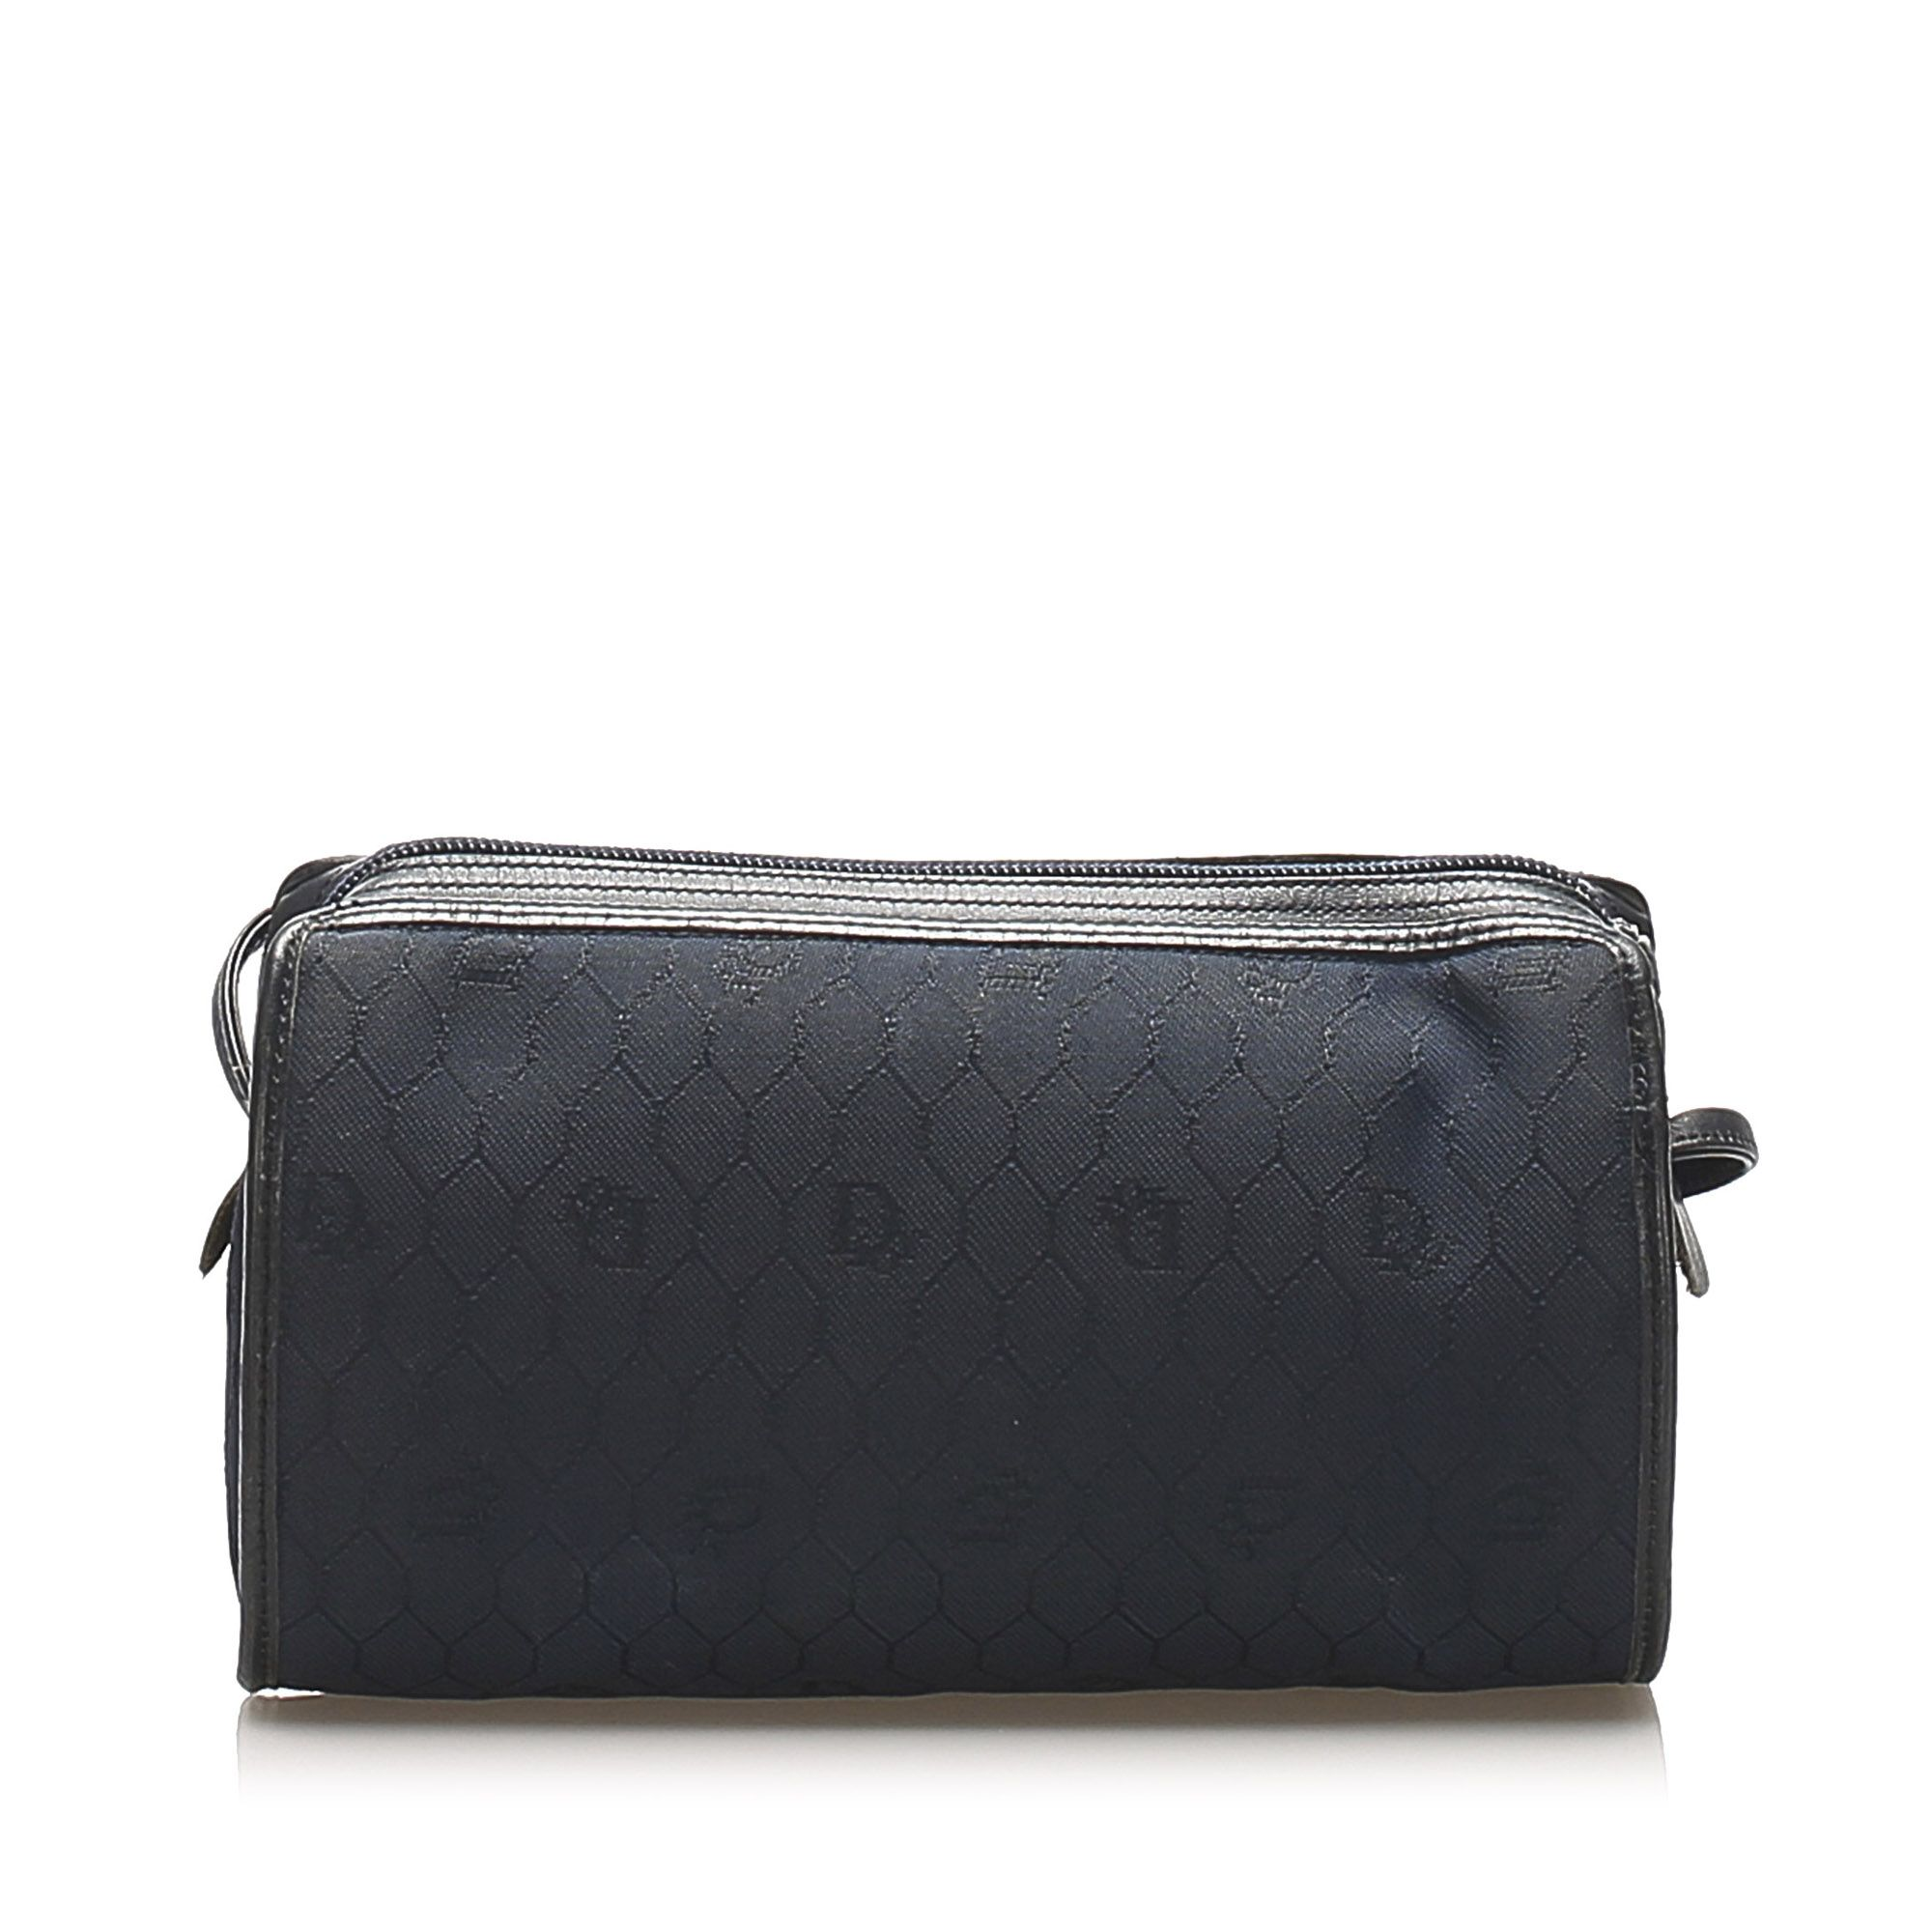 Vintage Dior Honeycomb Canvas Crossbody Bag Black